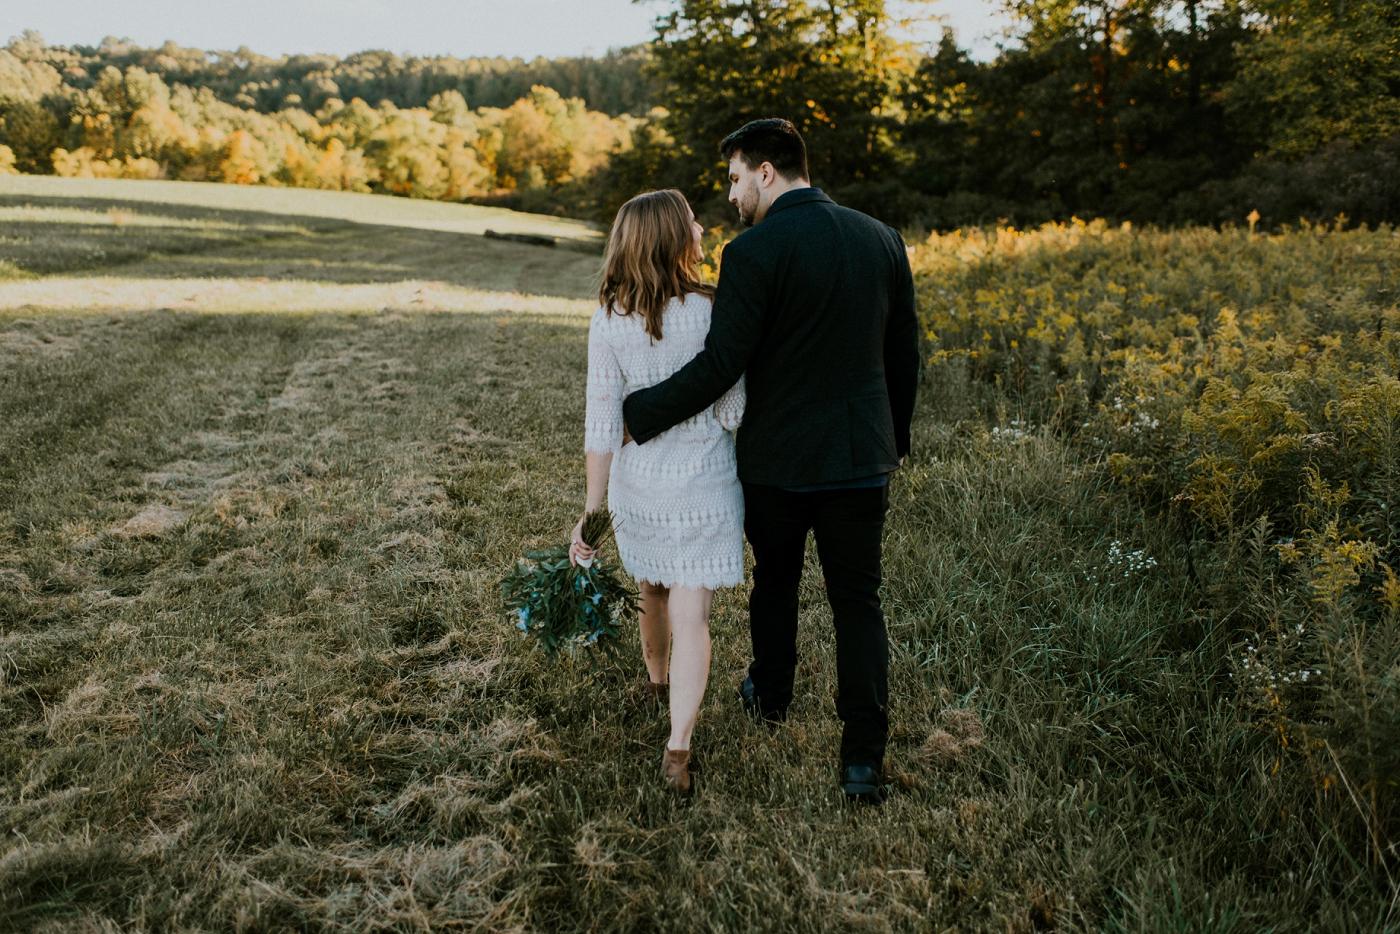 Wildflower-Field-Elopement-Vow-Renewal_Lisa+Chad_MJPHOTO-42.JPG